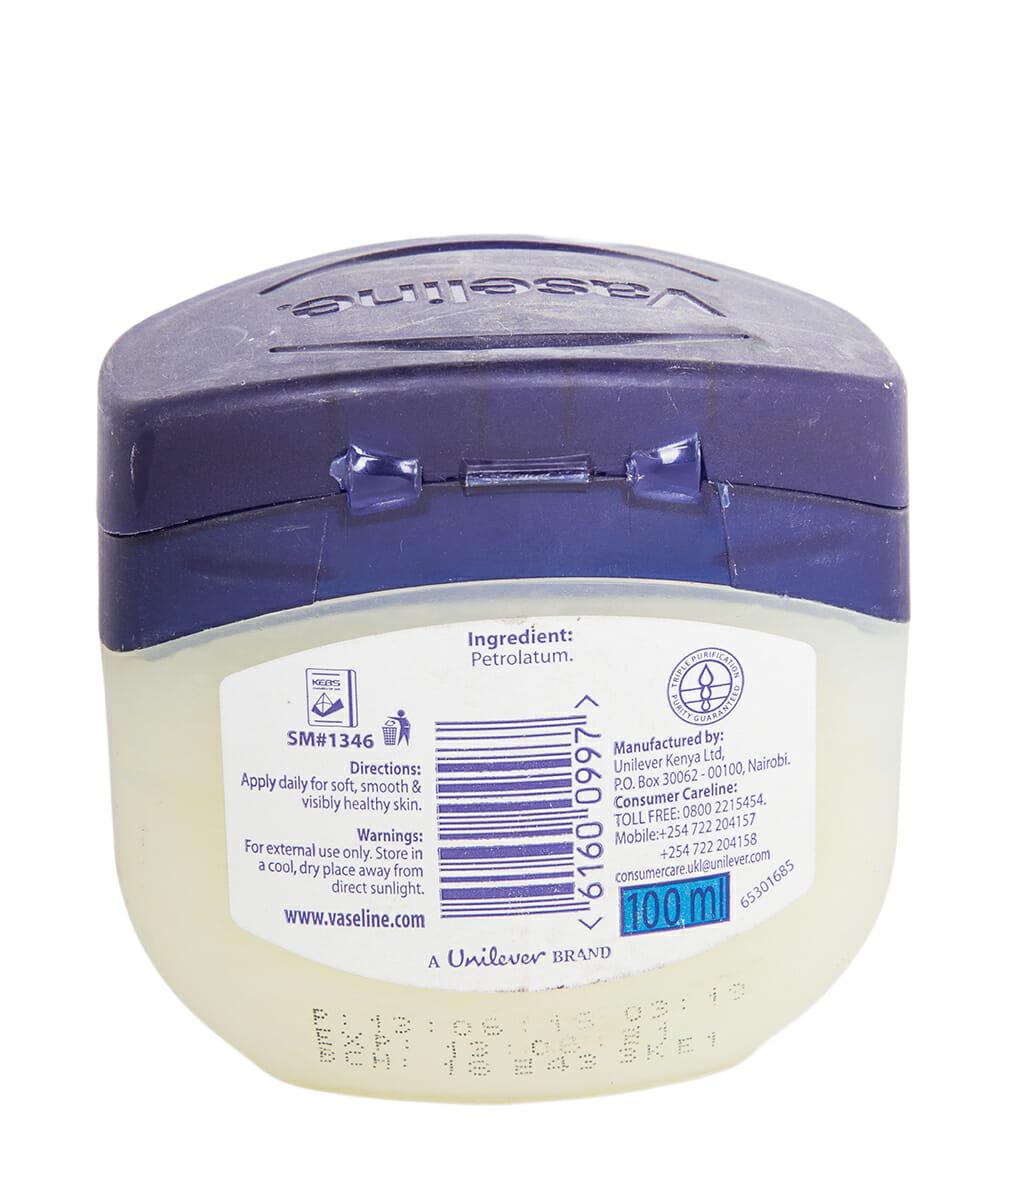 Vaseline Blue Seal Original Petroleum Jelly 100ml